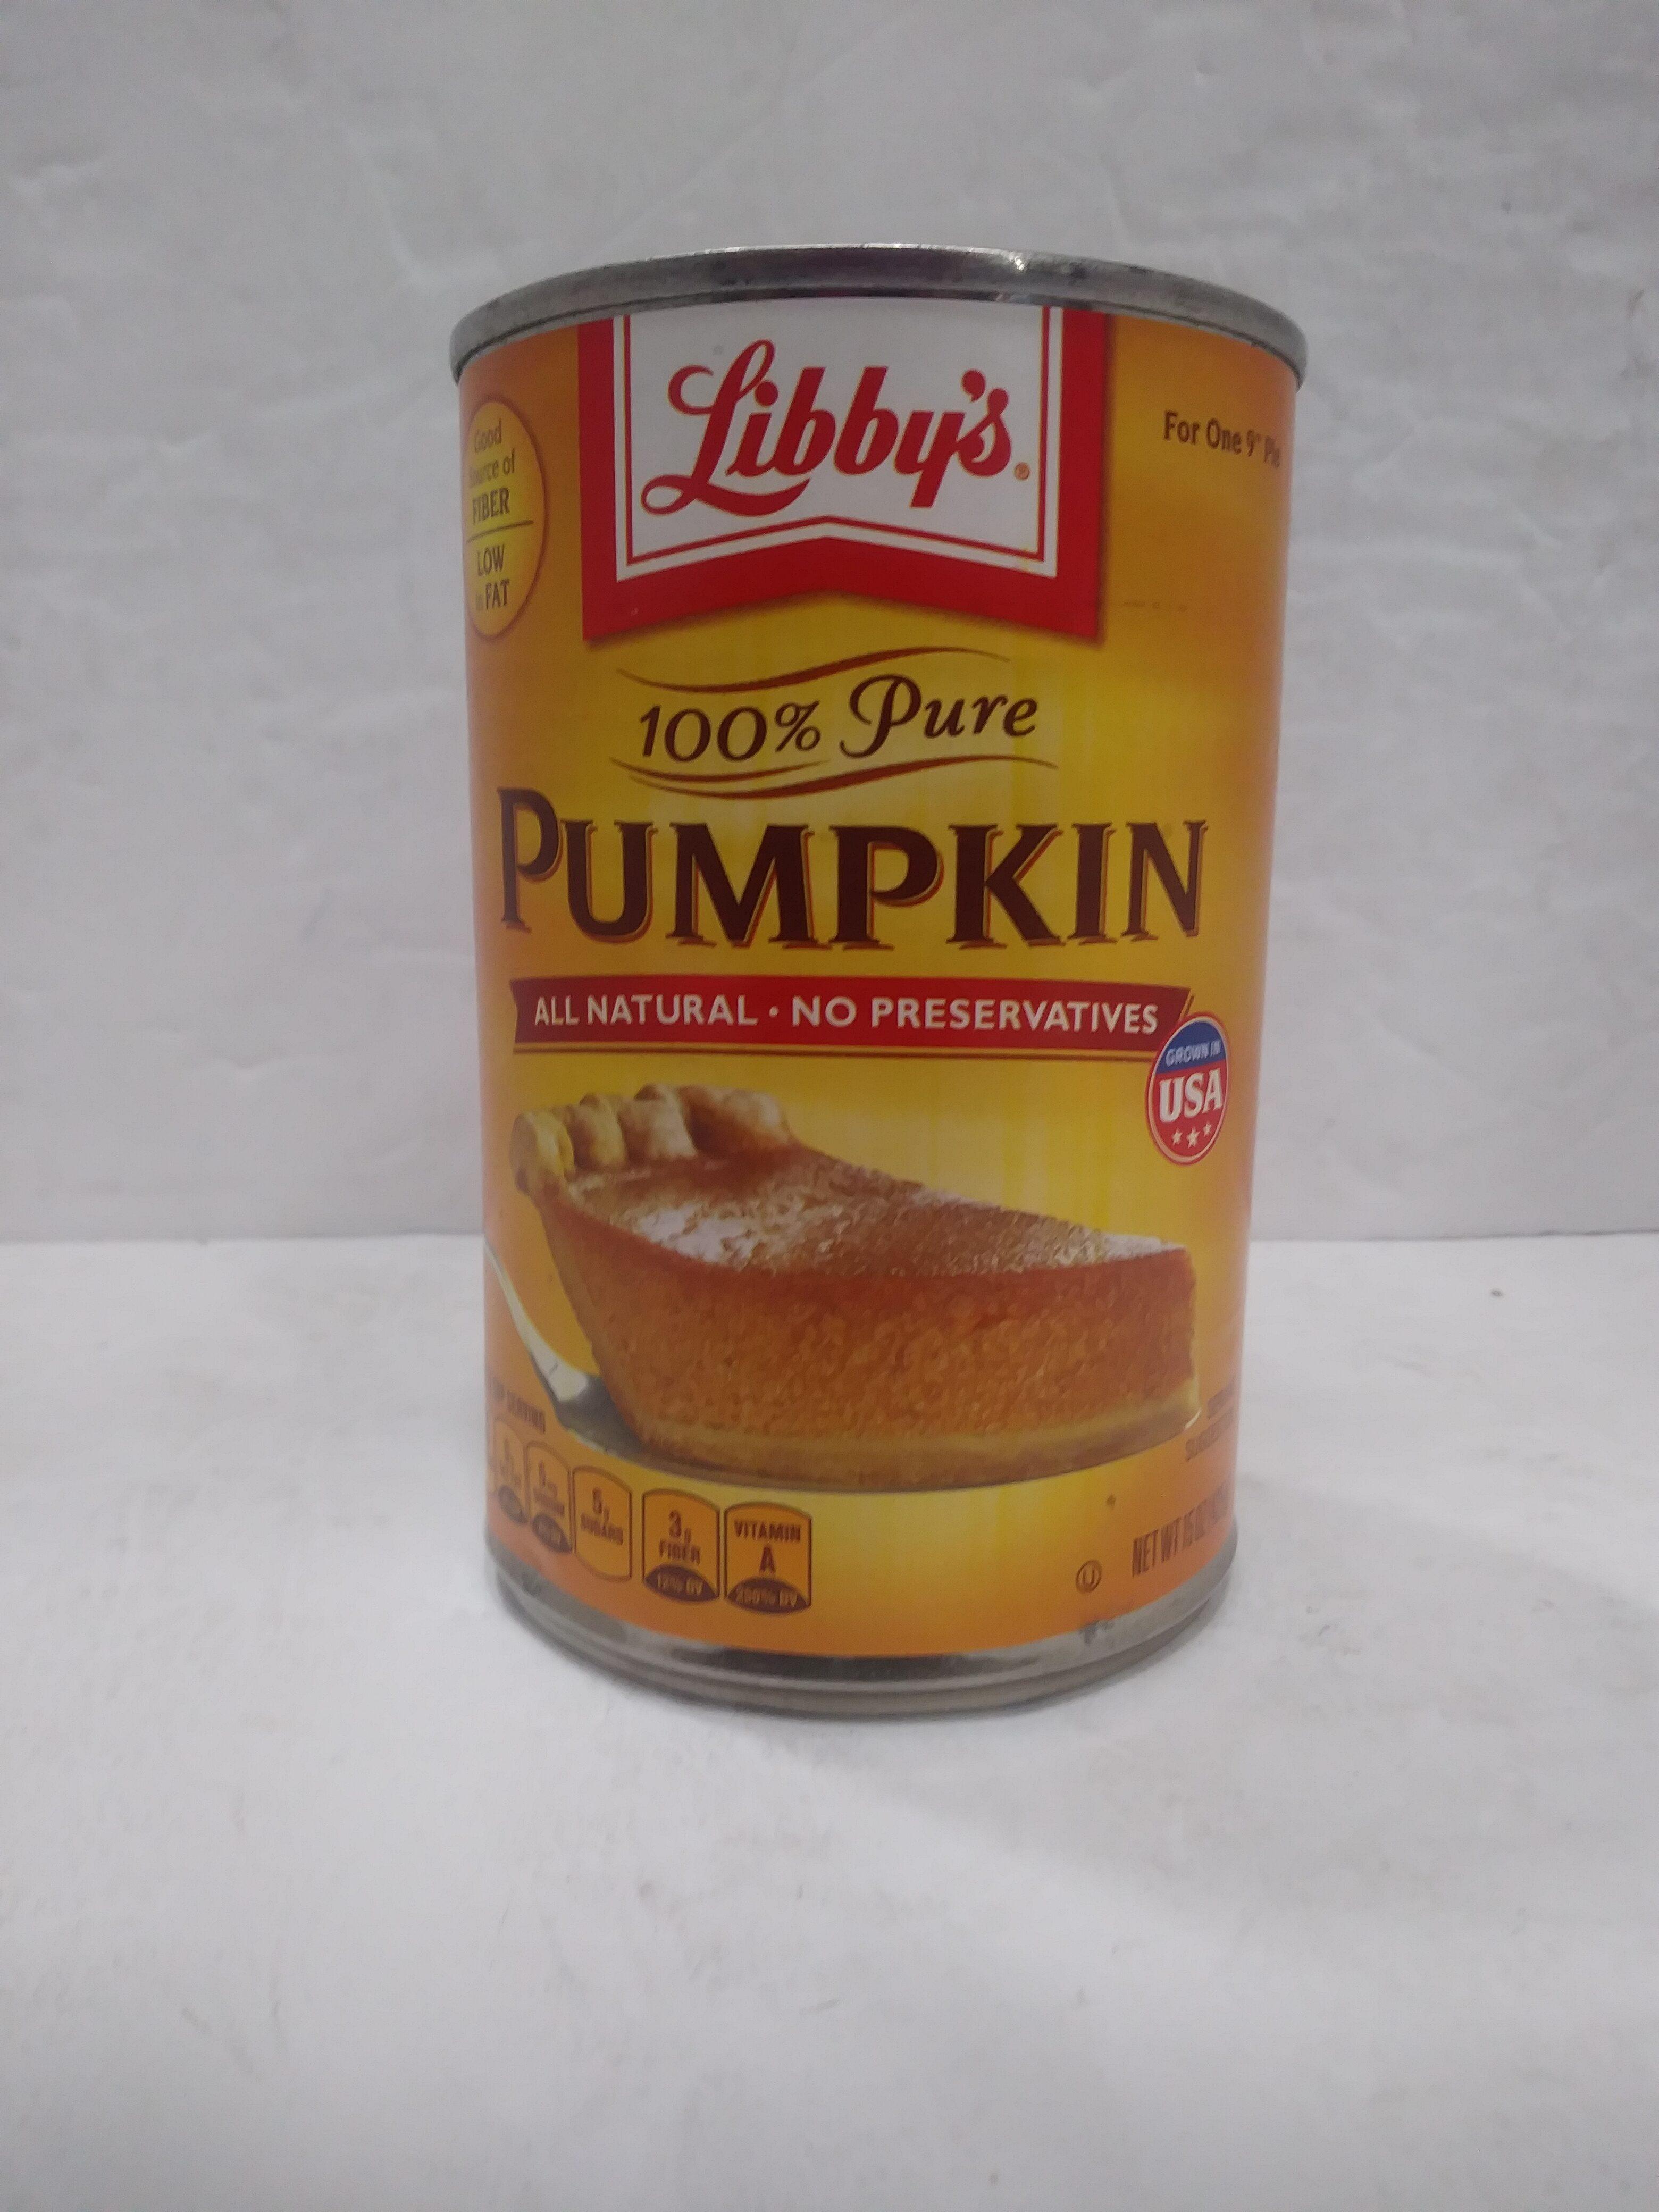 Pumpkin - Product - en